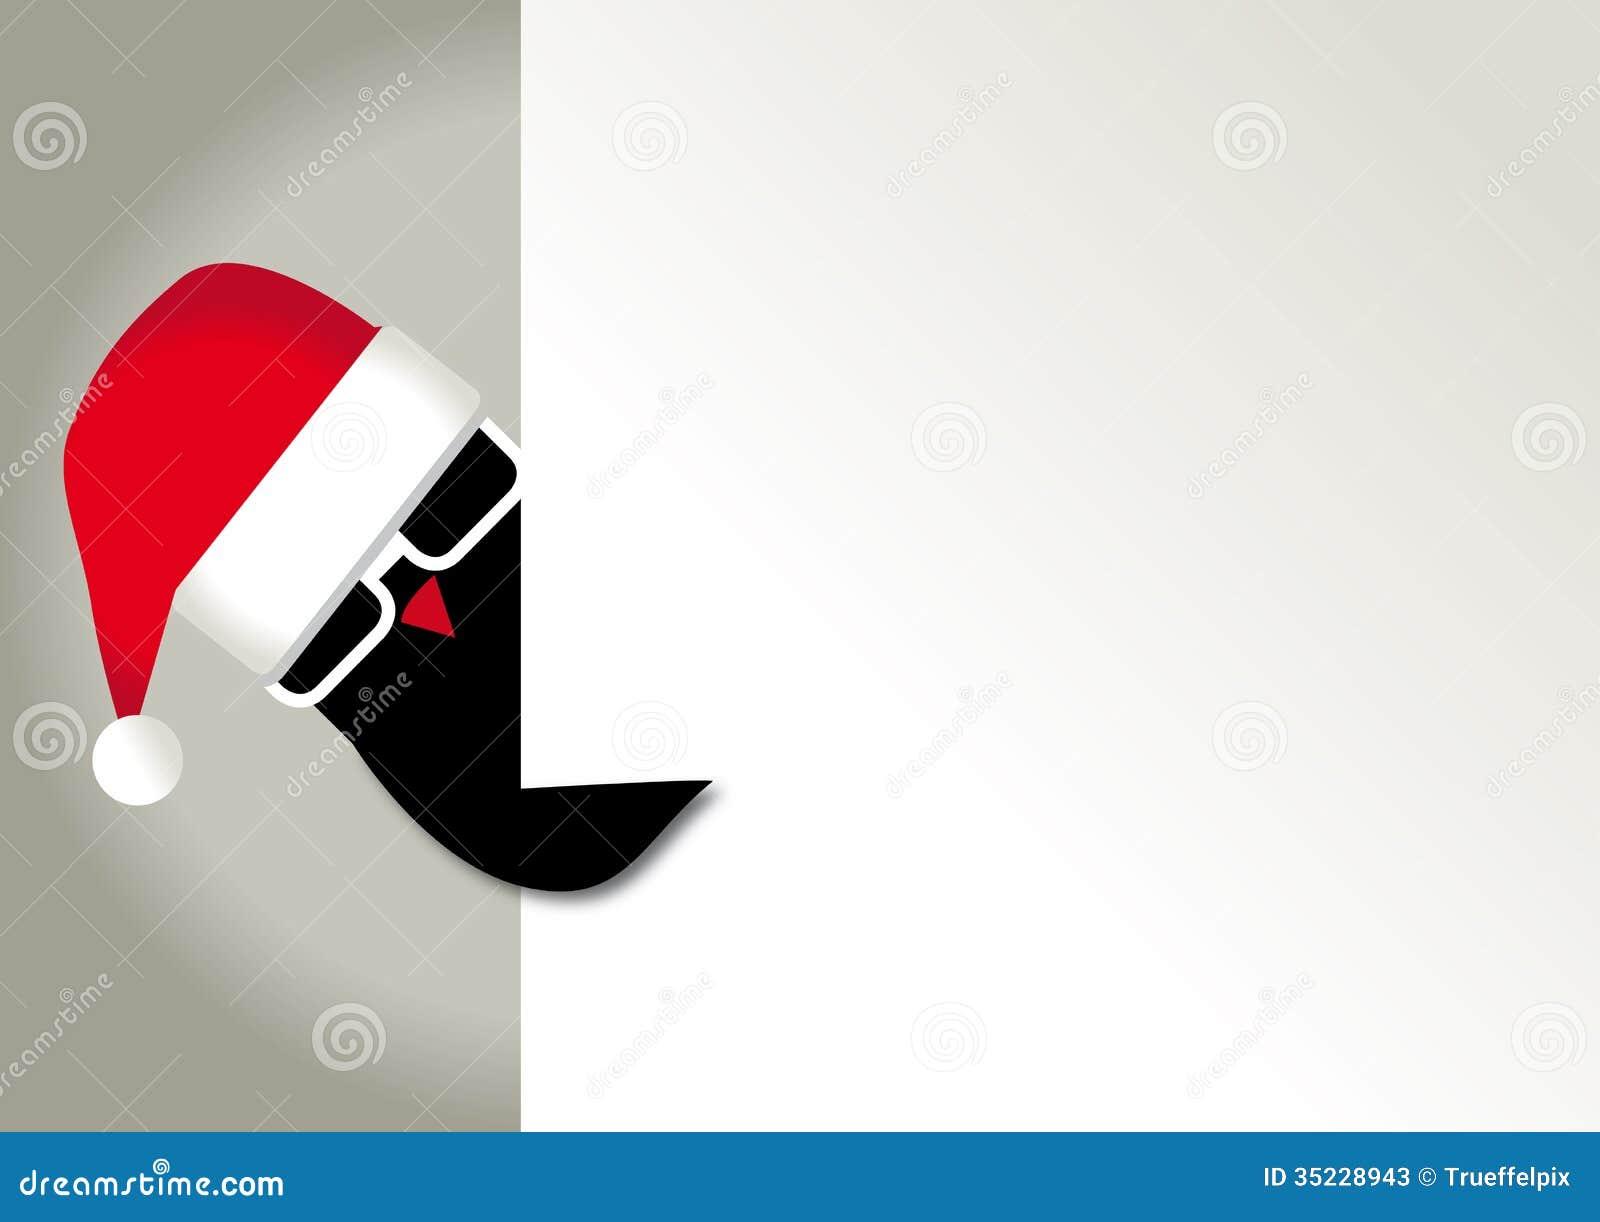 gift voucher santa claus stock illustration image 62198405 christmas gift voucher landscape stock photos